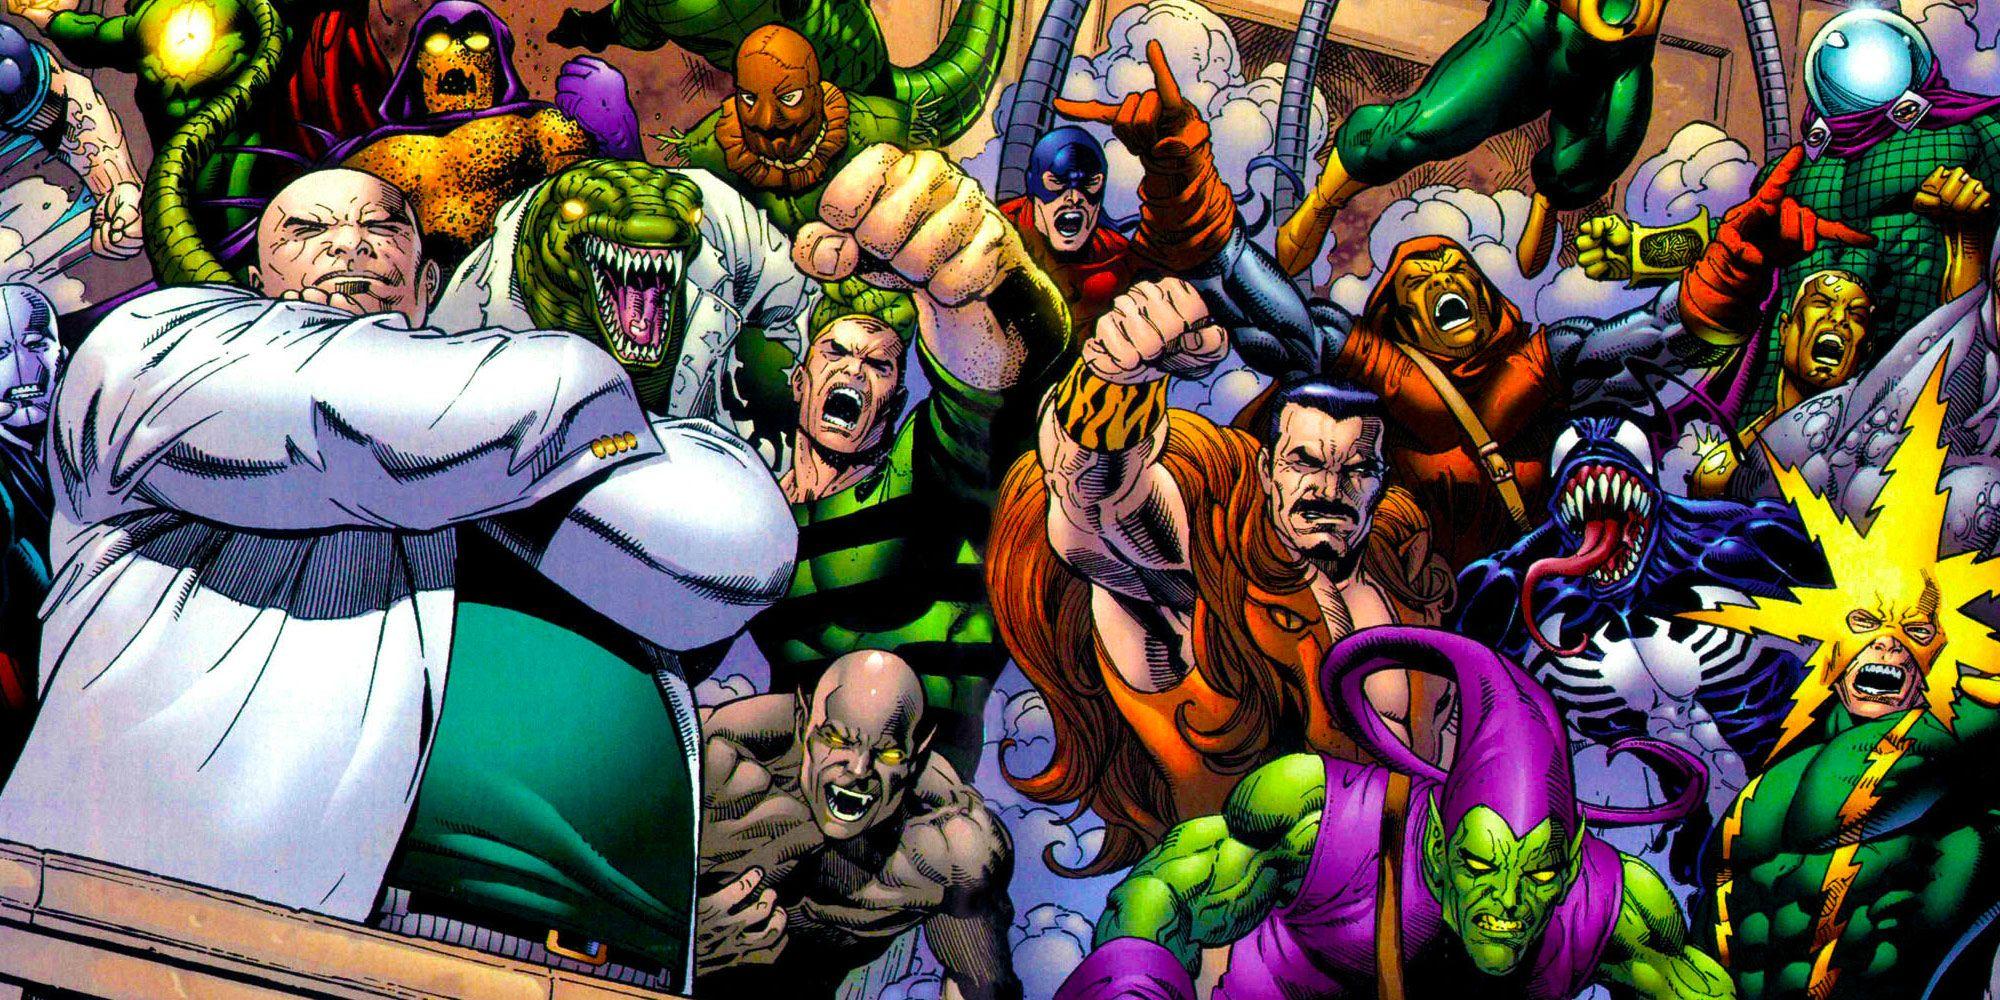 REPORT: Marvel Casting Call Indicates a Major Villain's Debut